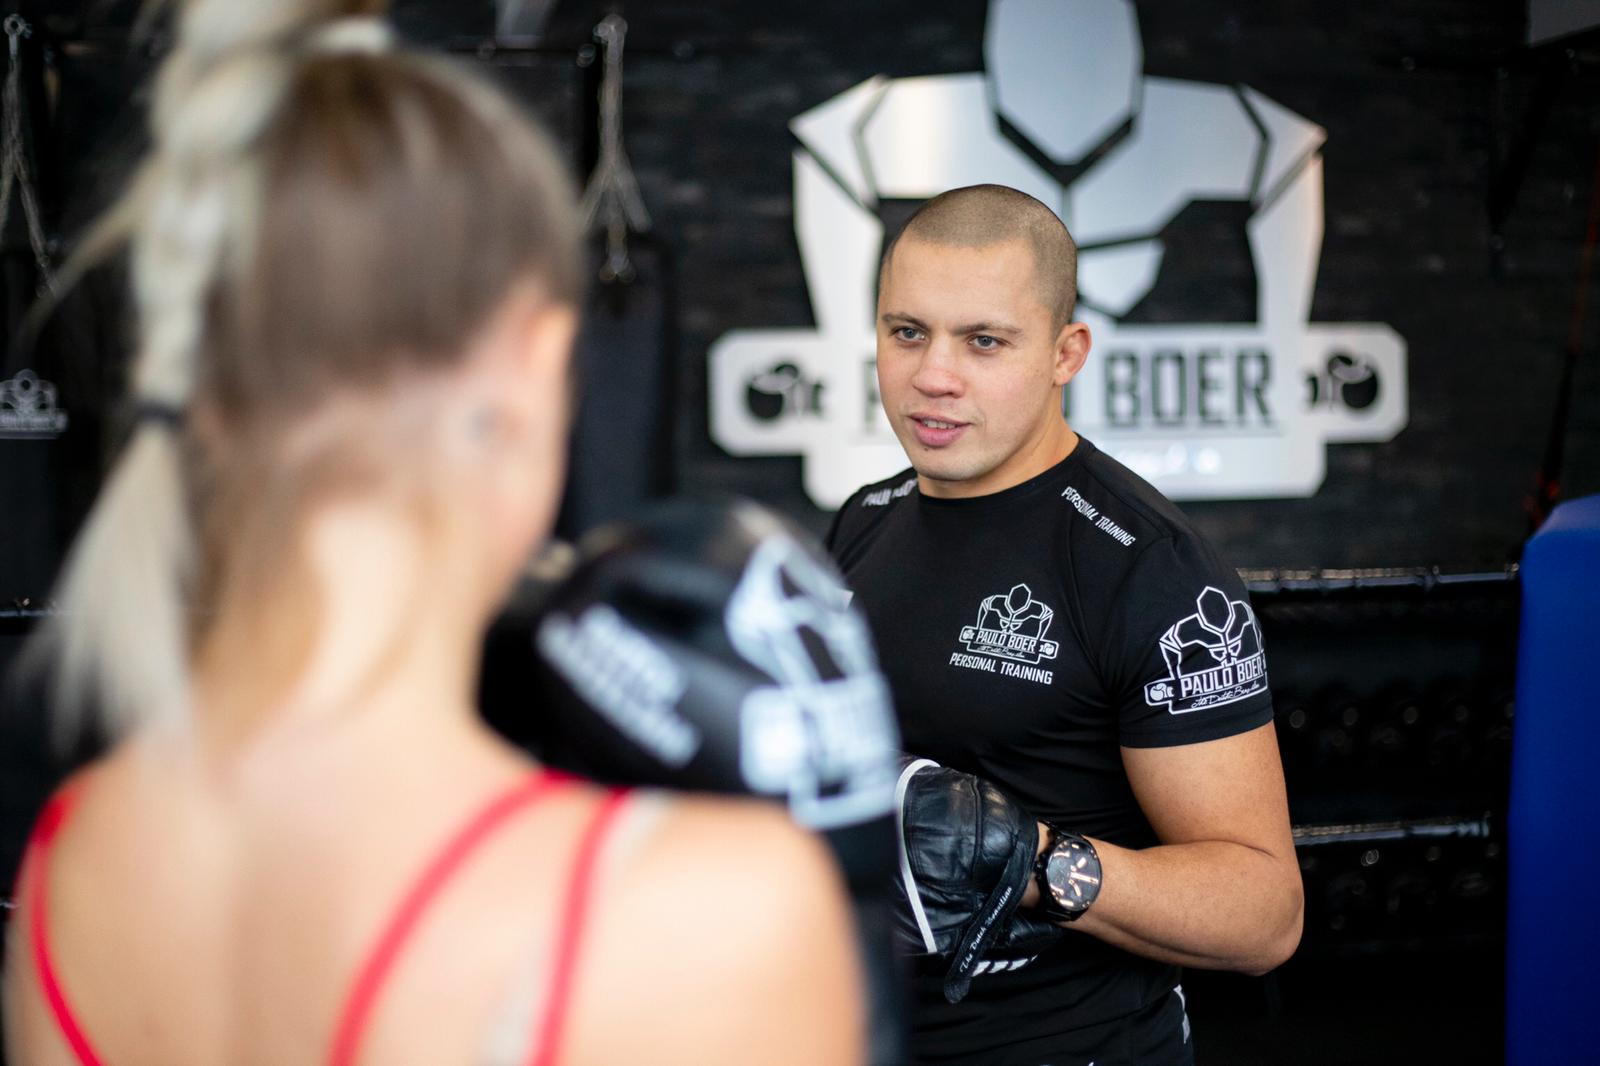 Personal trainer Paulo Boer